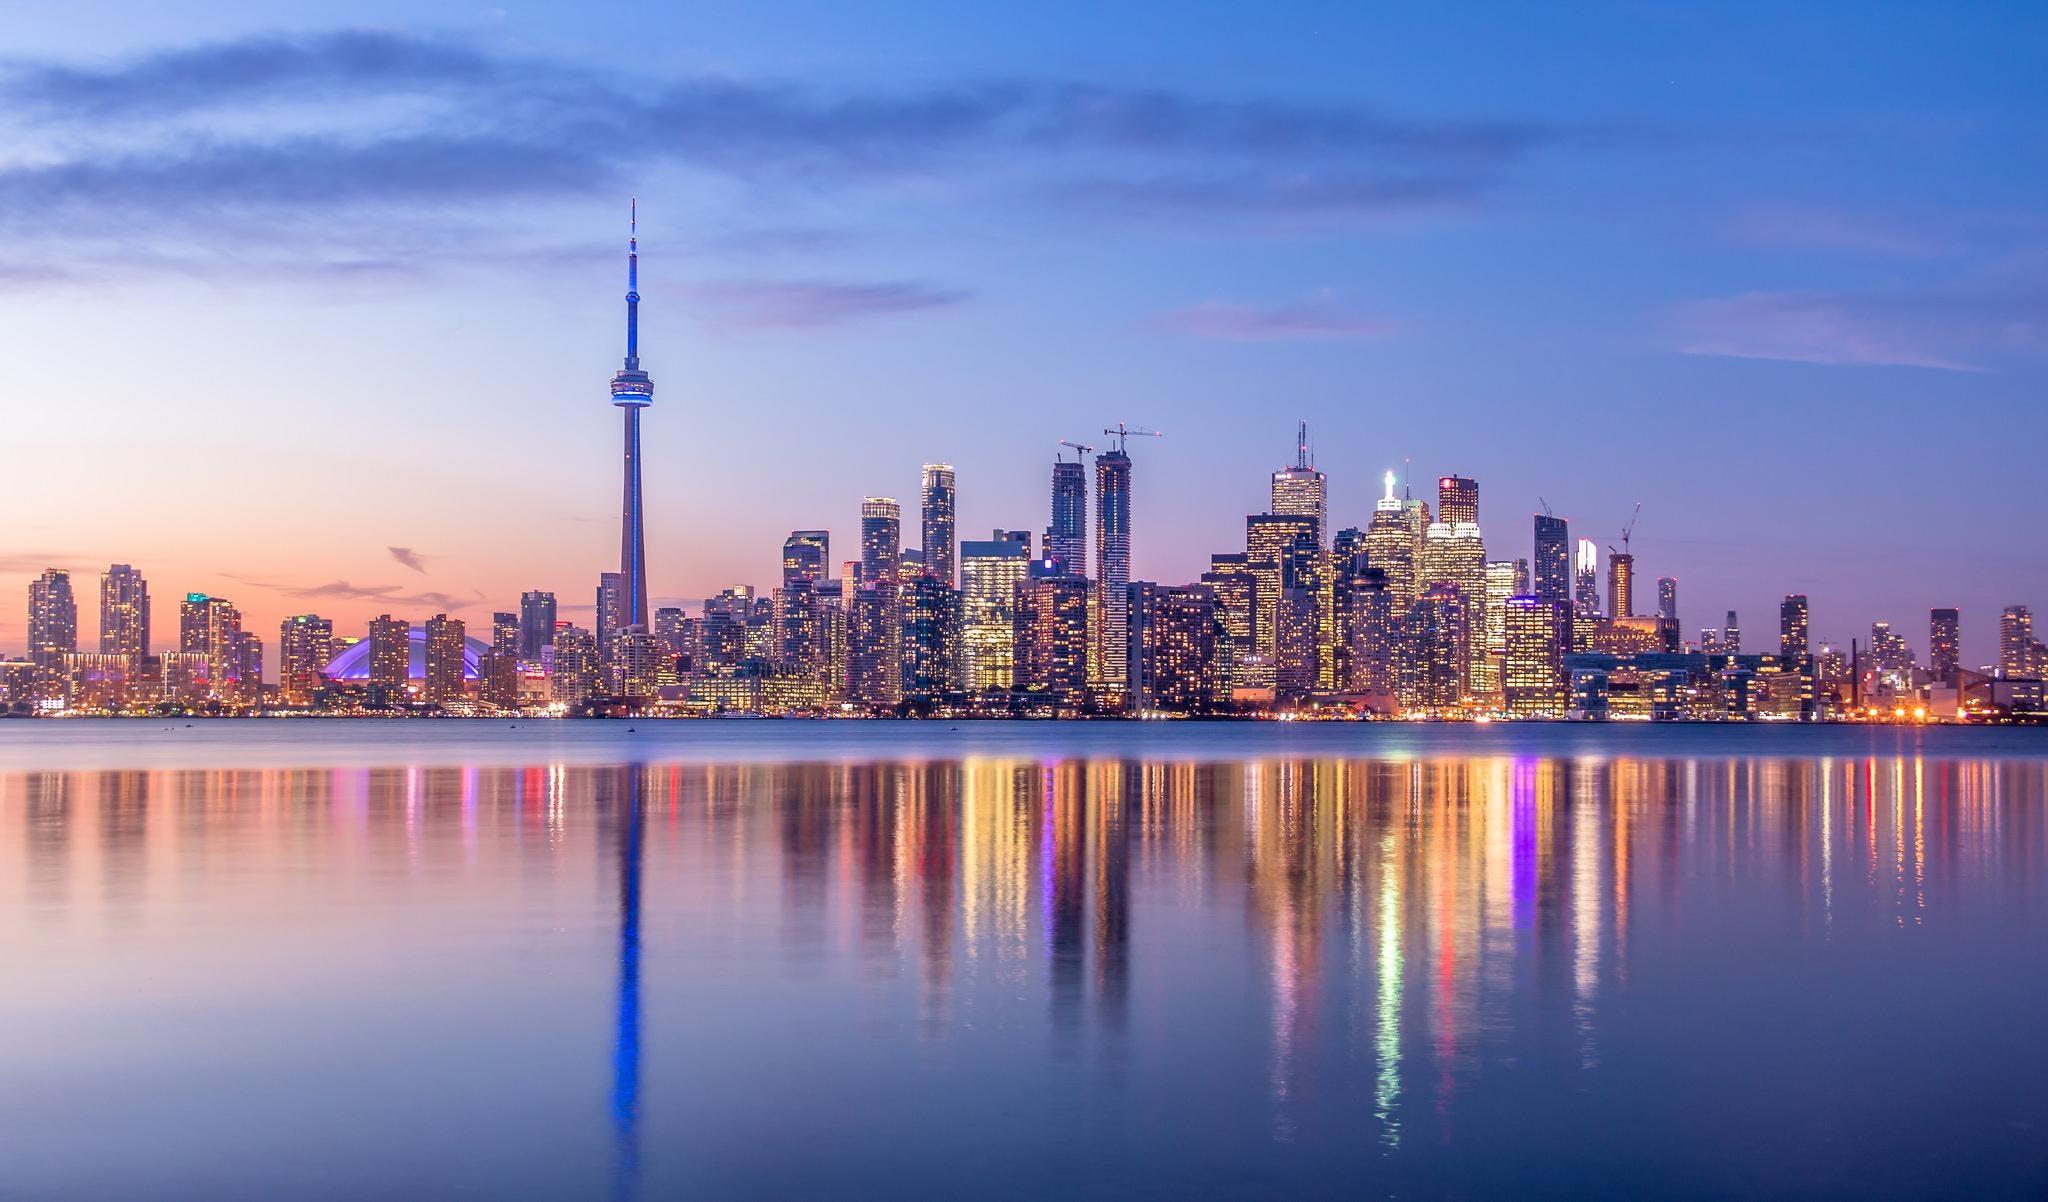 Collision Toronto 2019 at MaRS Discovery District Toronto